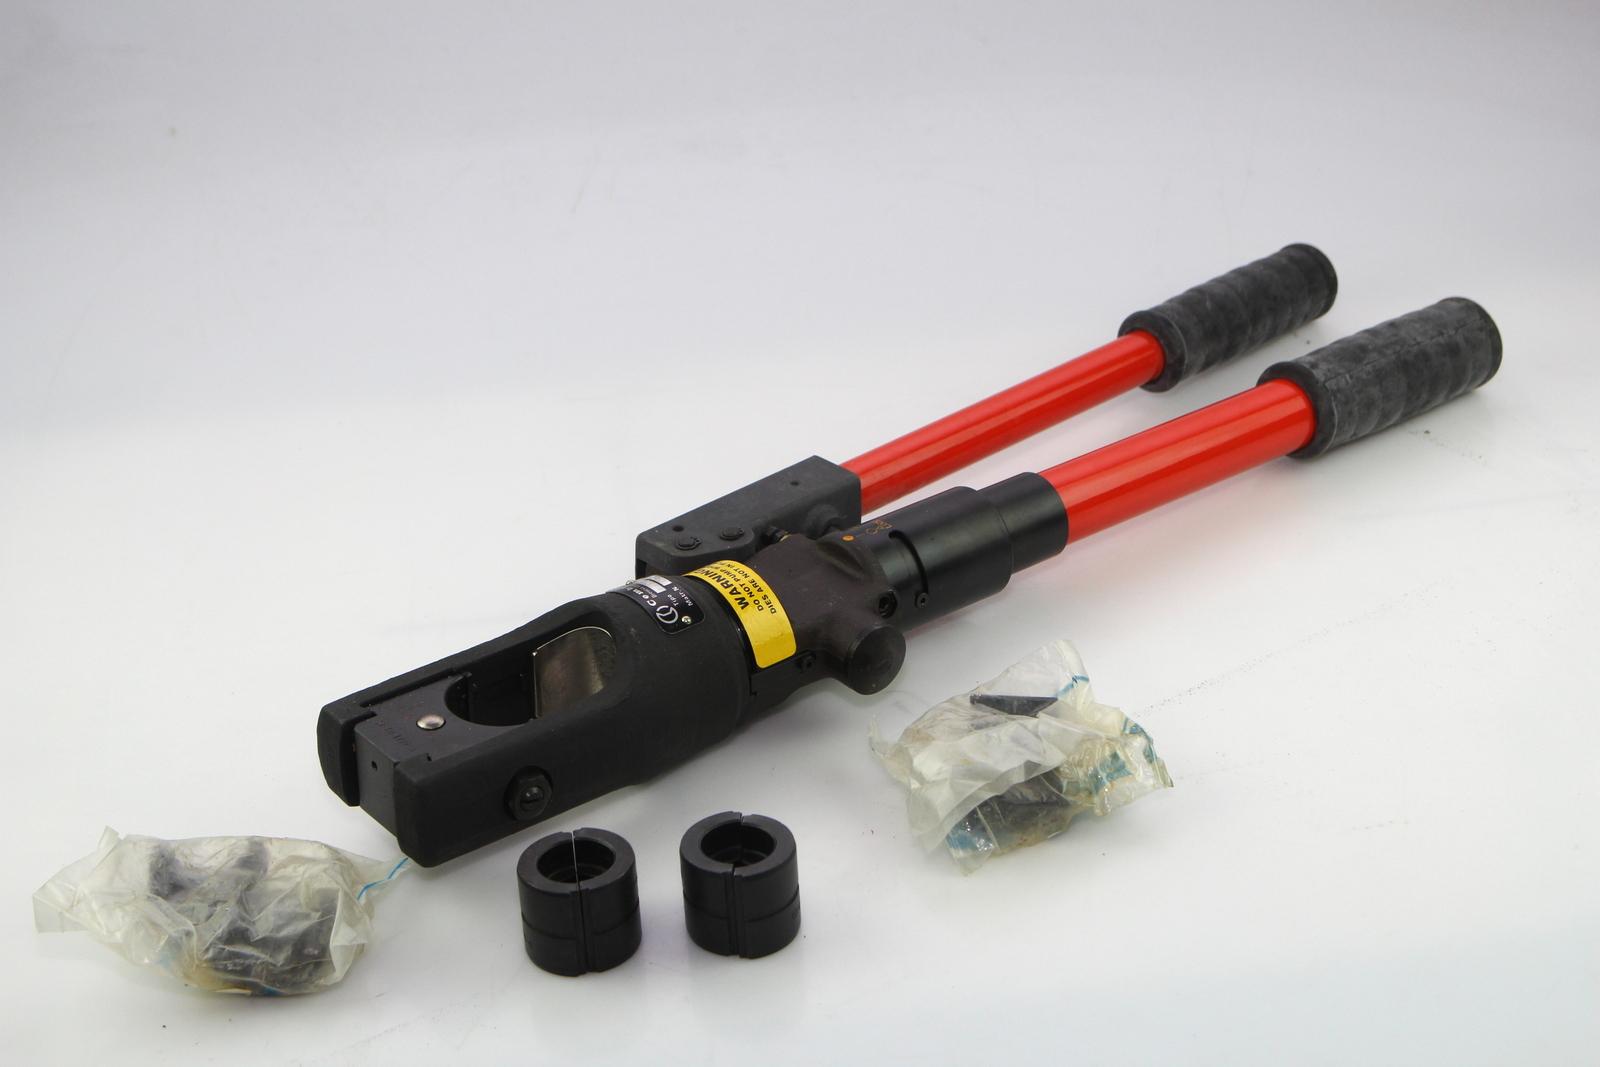 cembre hydraulic crimping tool ht 130 u ebay. Black Bedroom Furniture Sets. Home Design Ideas